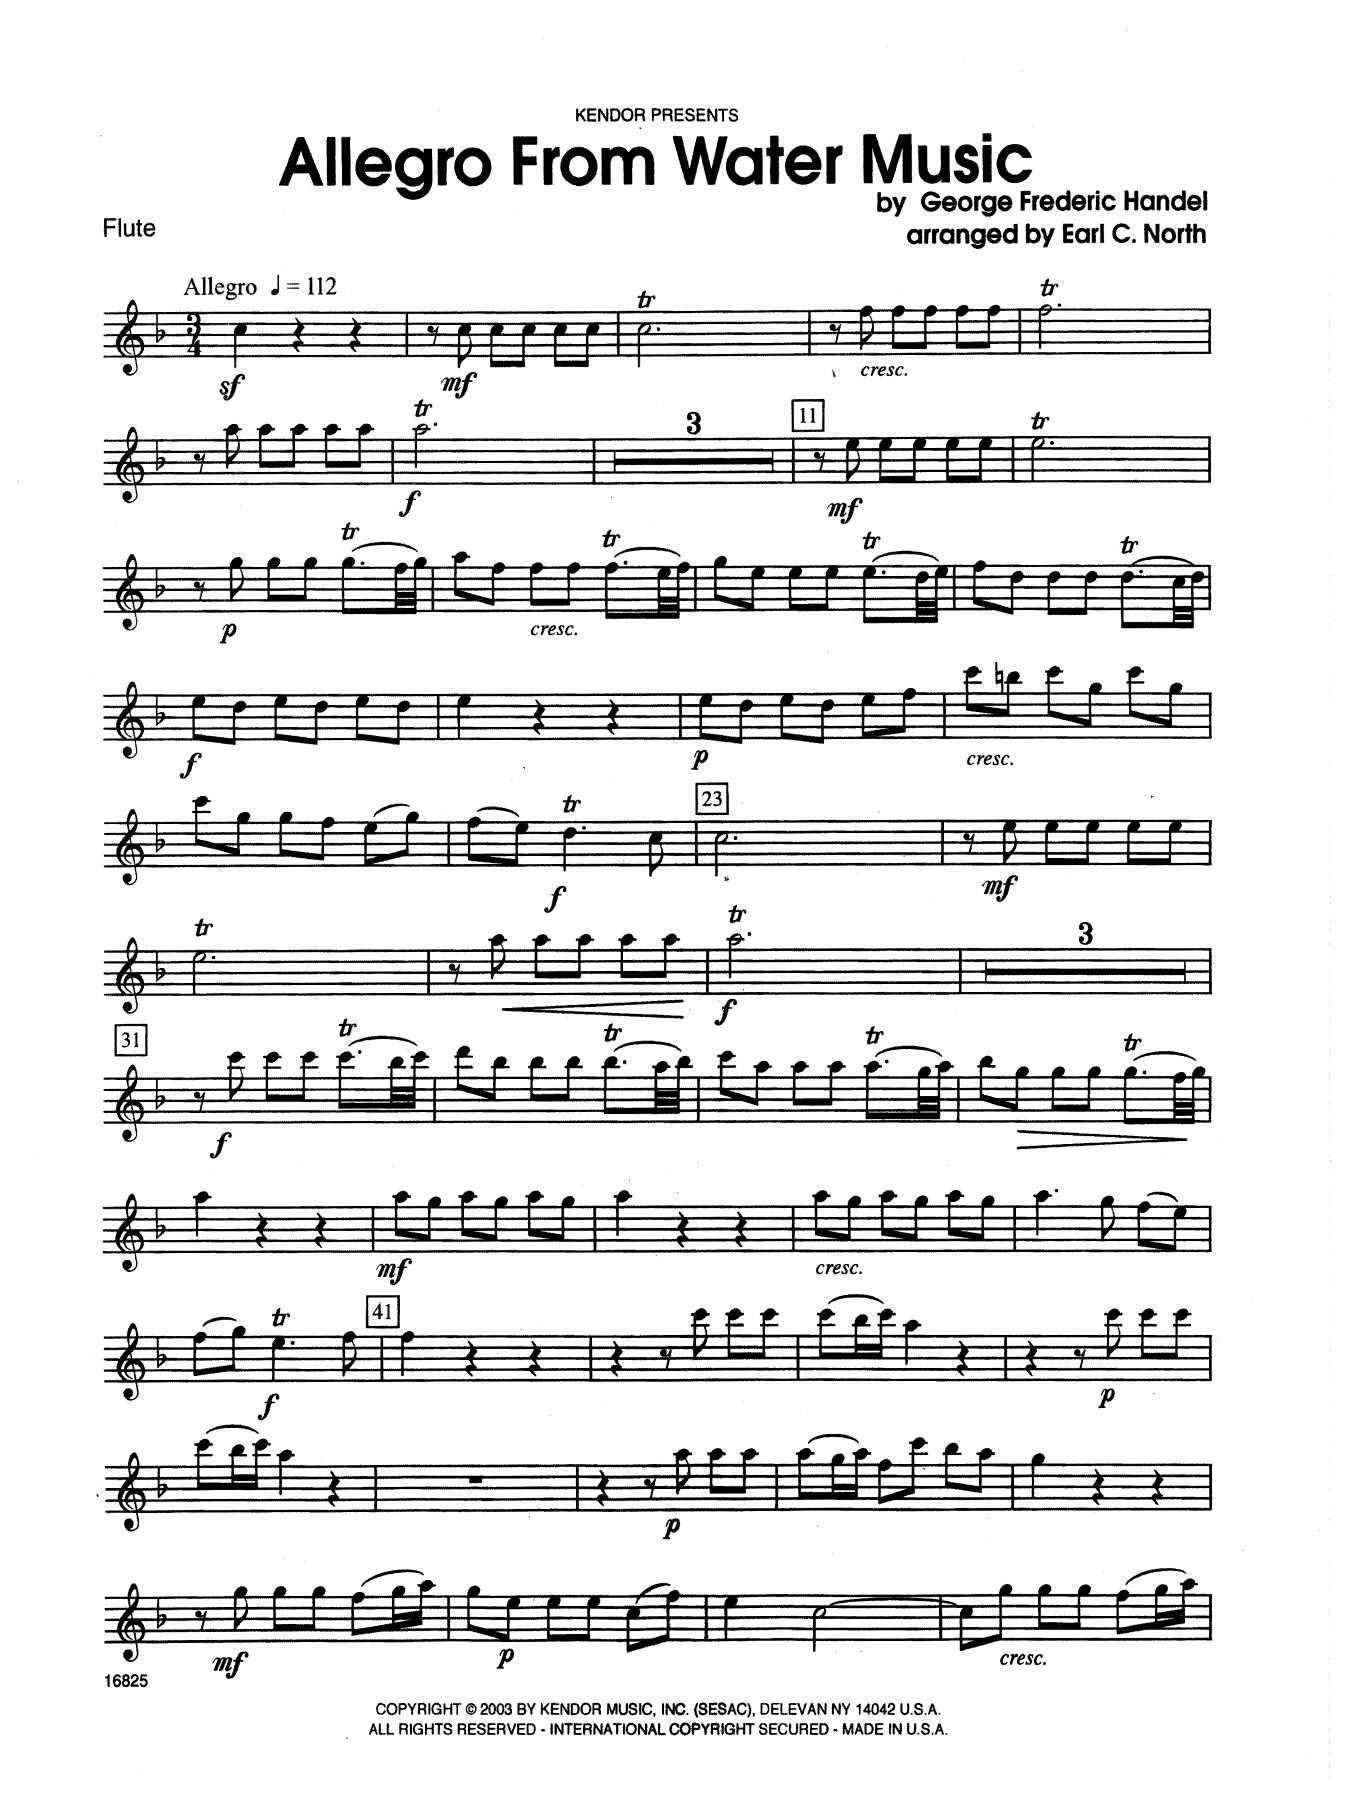 Allegro From Water Music - Flute Sheet Music